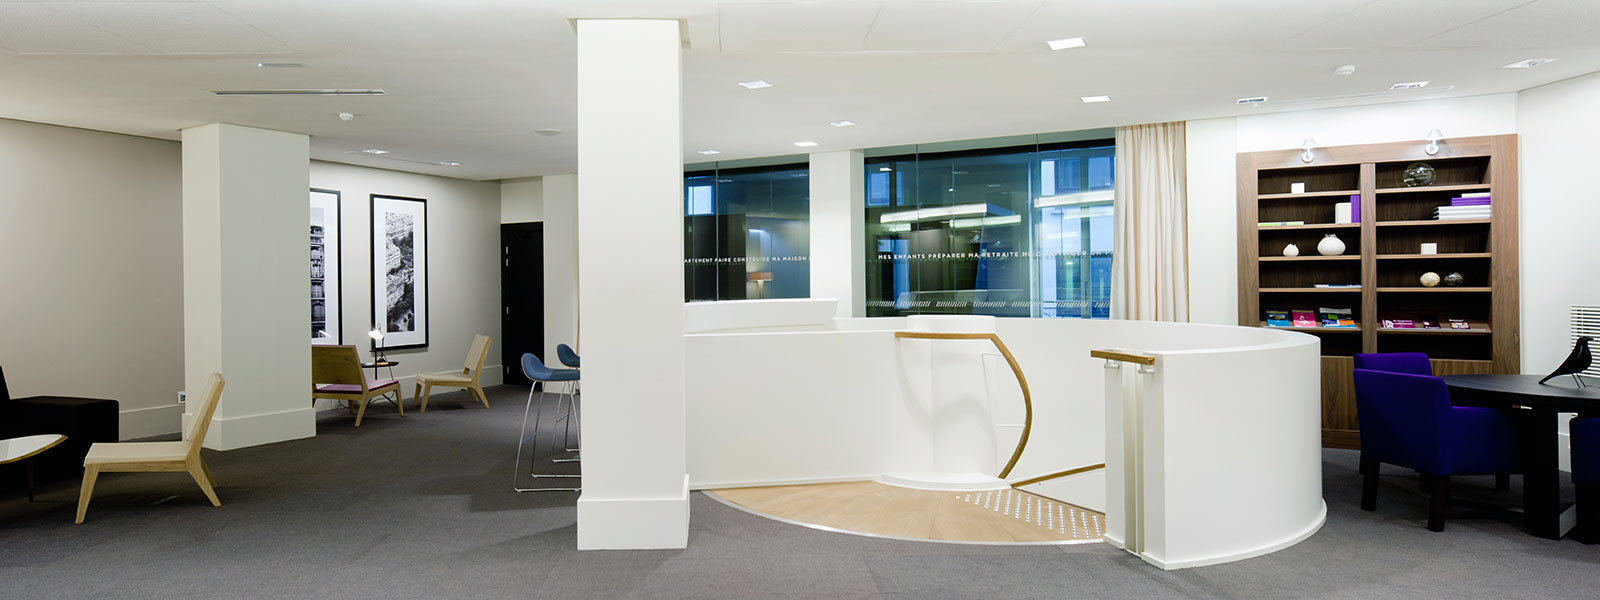 bruno bini architecte d 39 int rieur. Black Bedroom Furniture Sets. Home Design Ideas